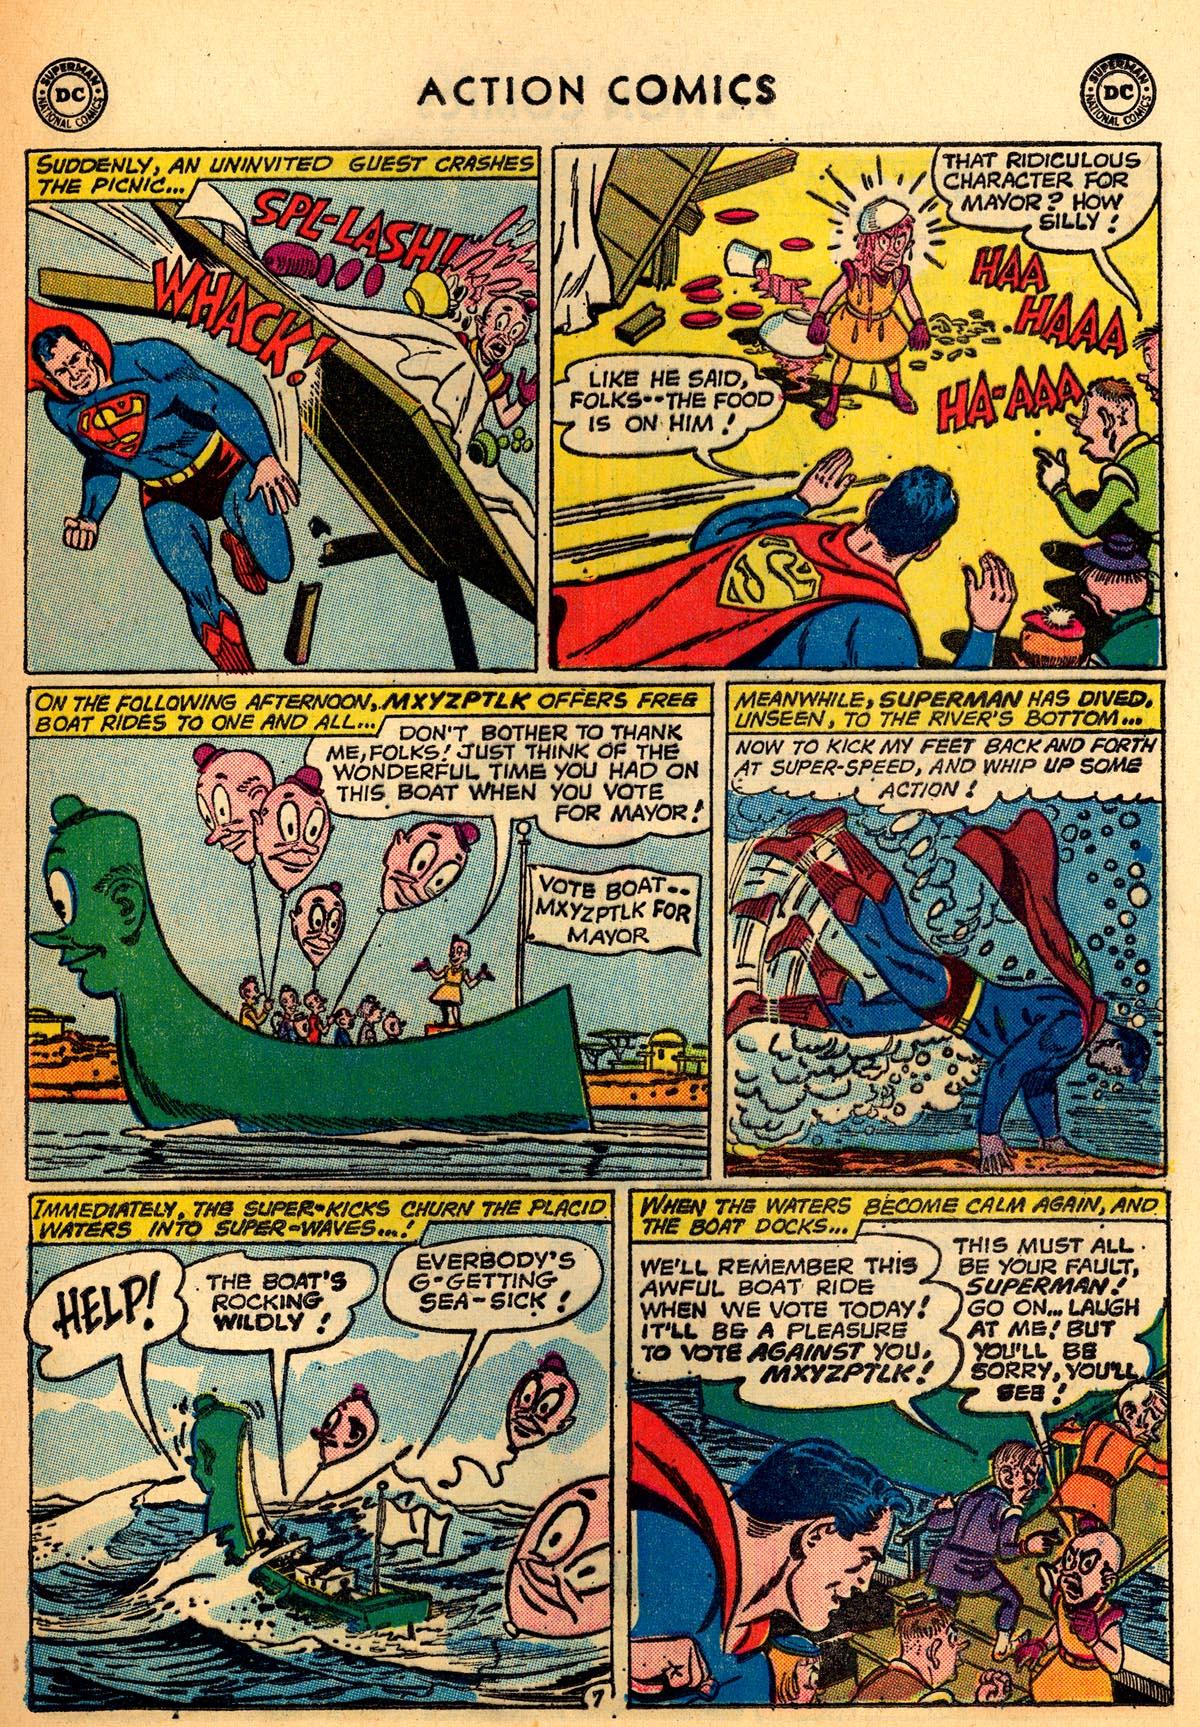 Action Comics (1938) 273 Page 8